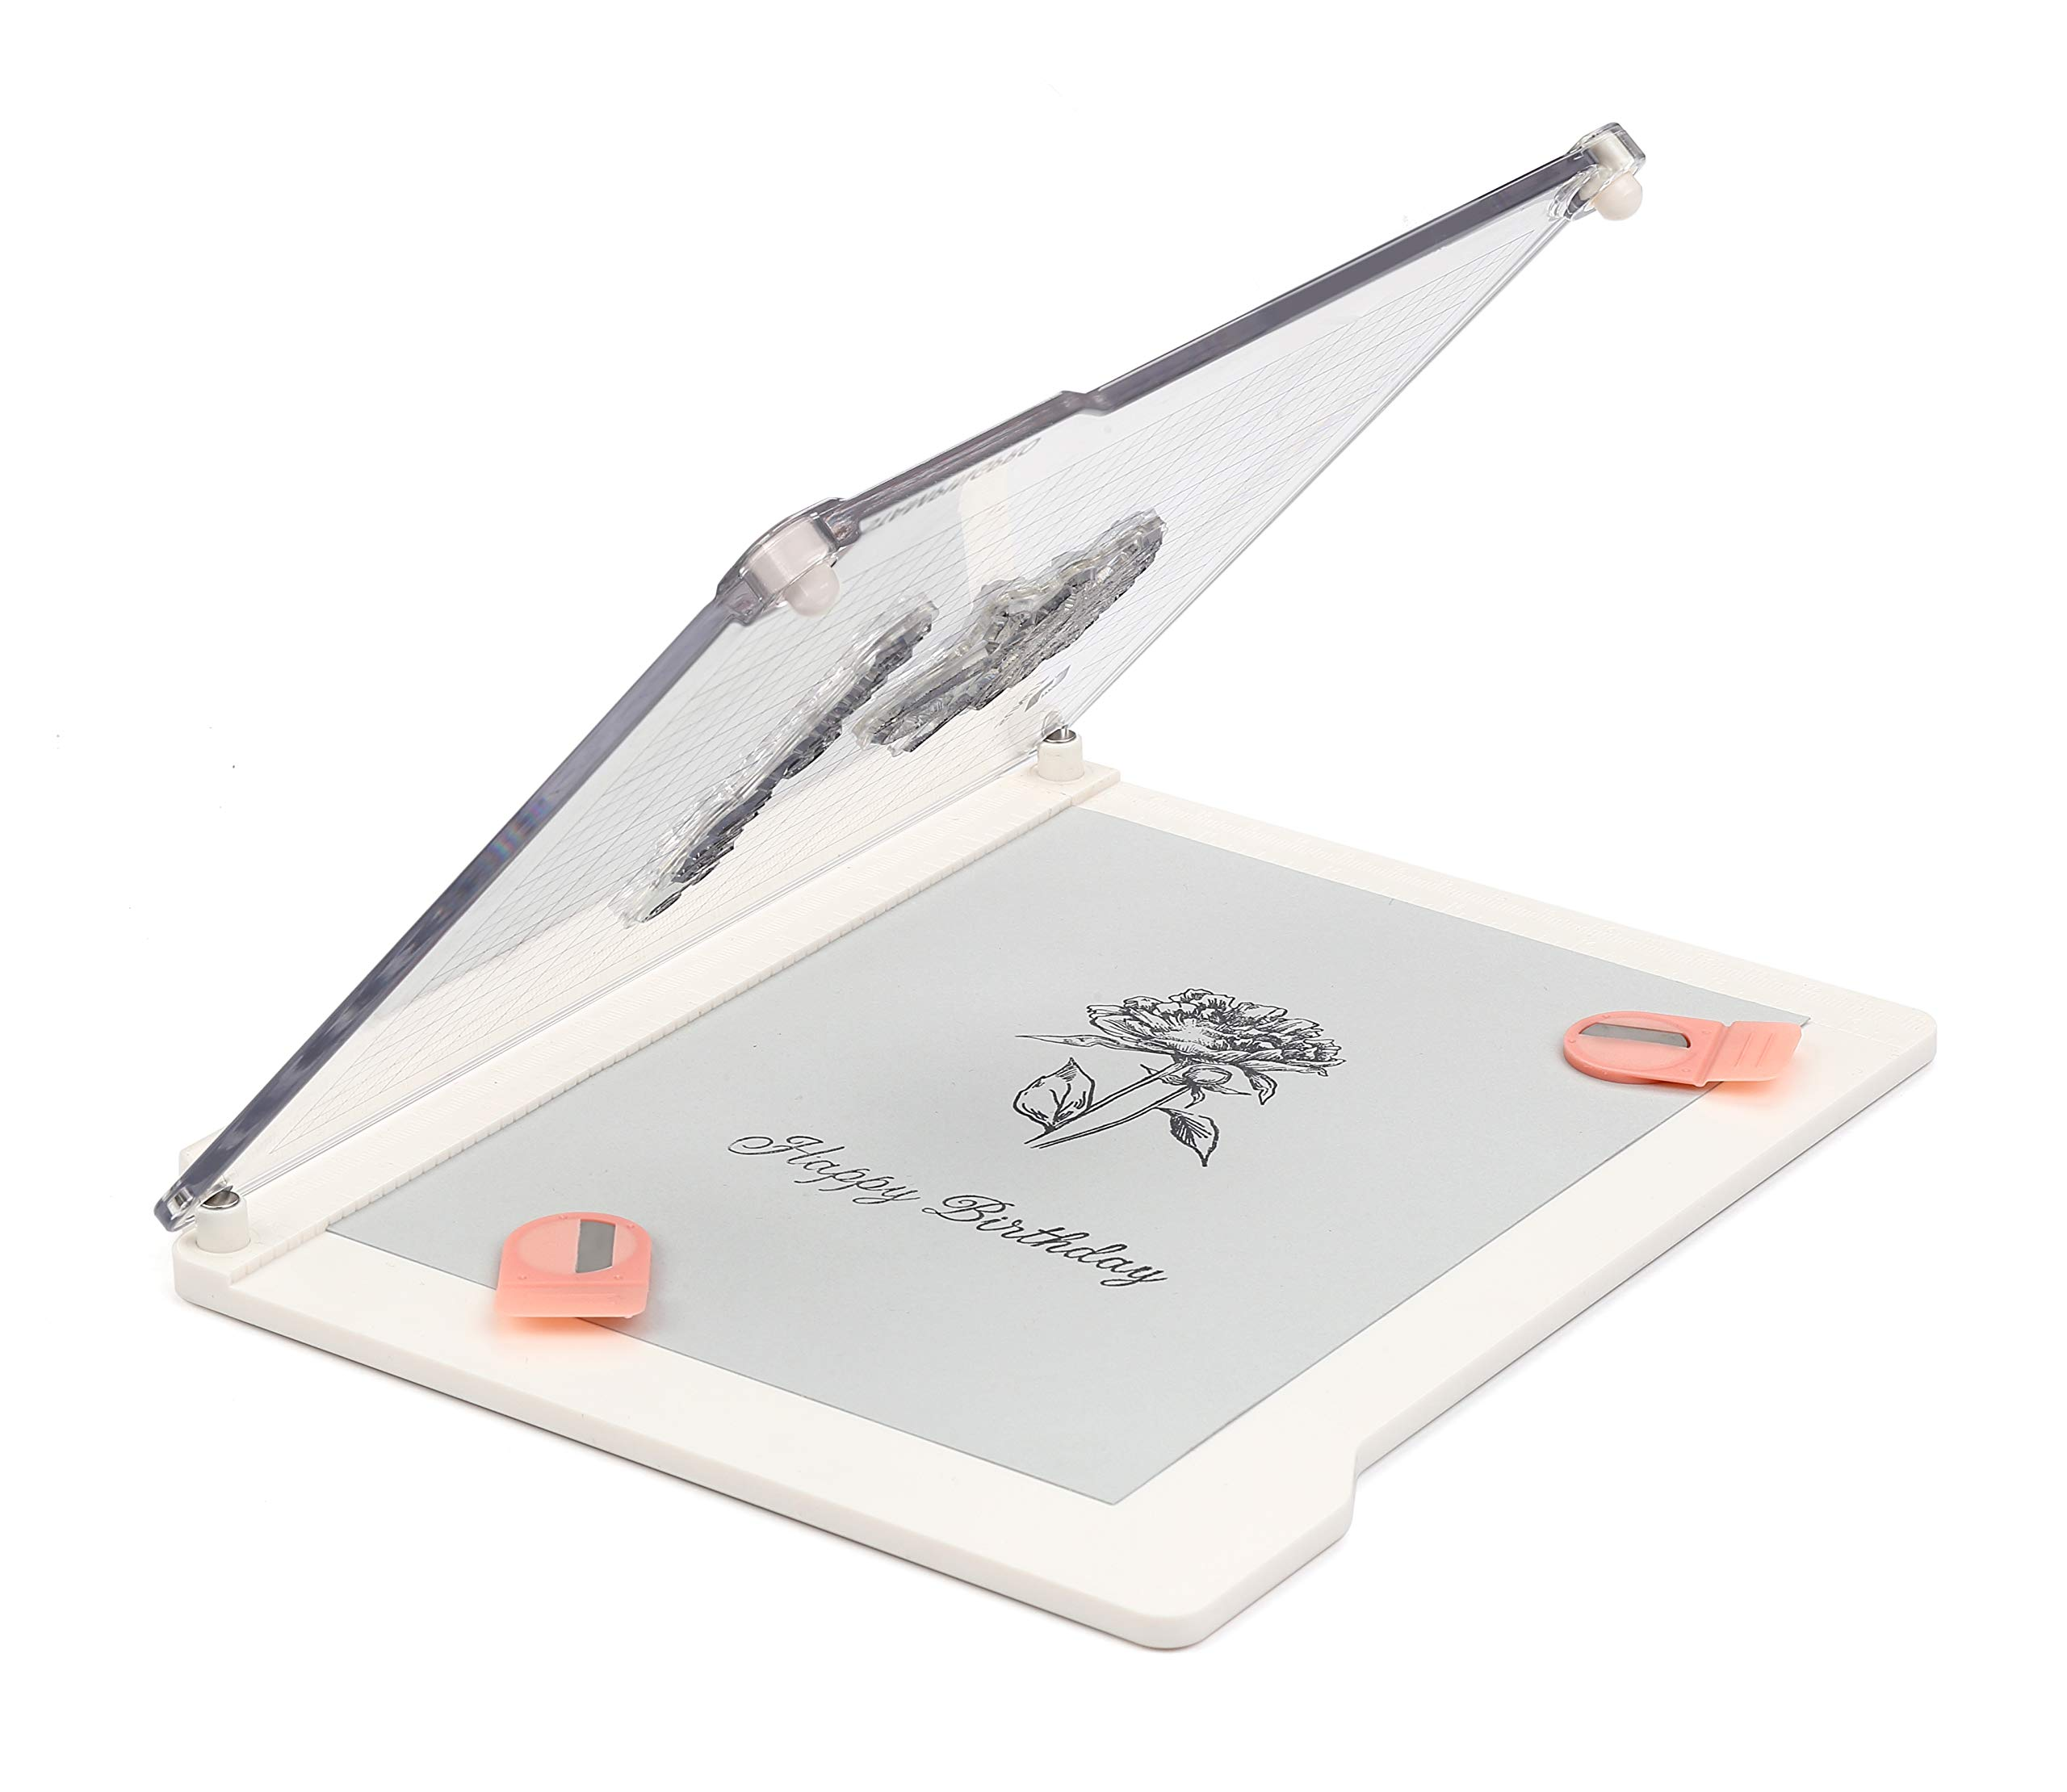 Bira Craft Easy Stamp Platform Tool for Accurate Craft Stamping (Stamp Tool) by Bira Craft